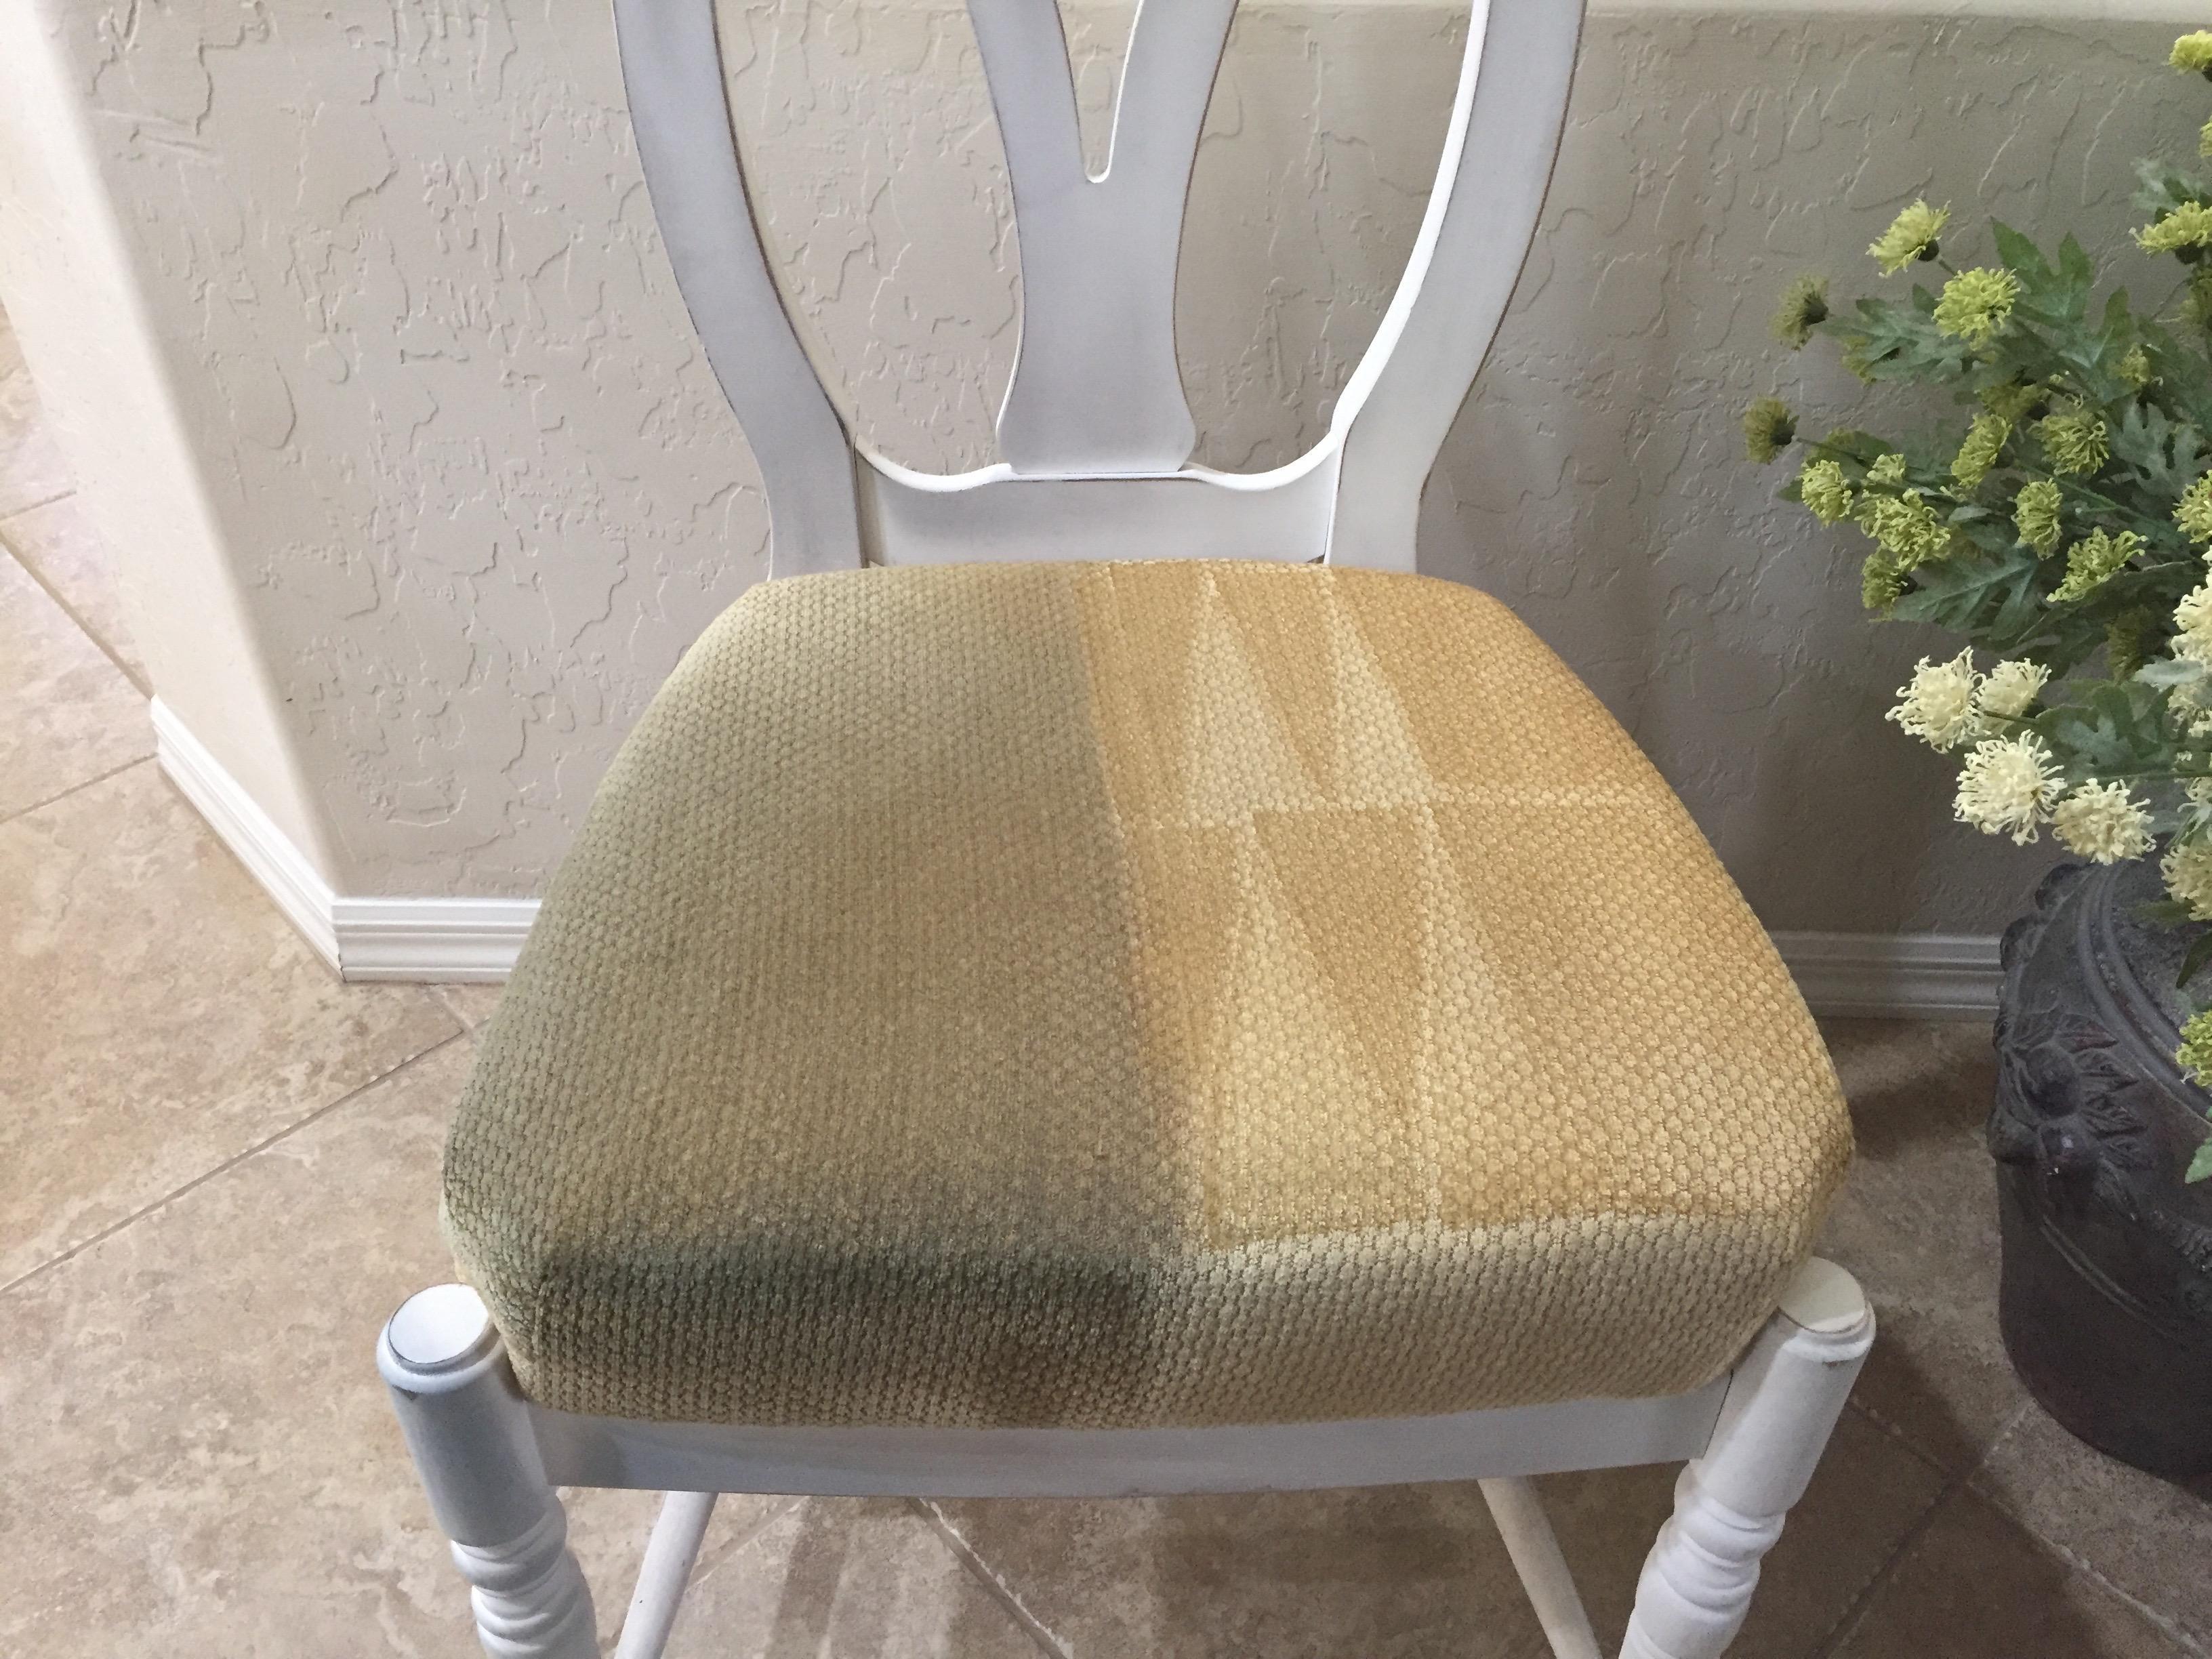 Complete Carpet and Tile Care in LAS VEGAS, NV - Carpet ...